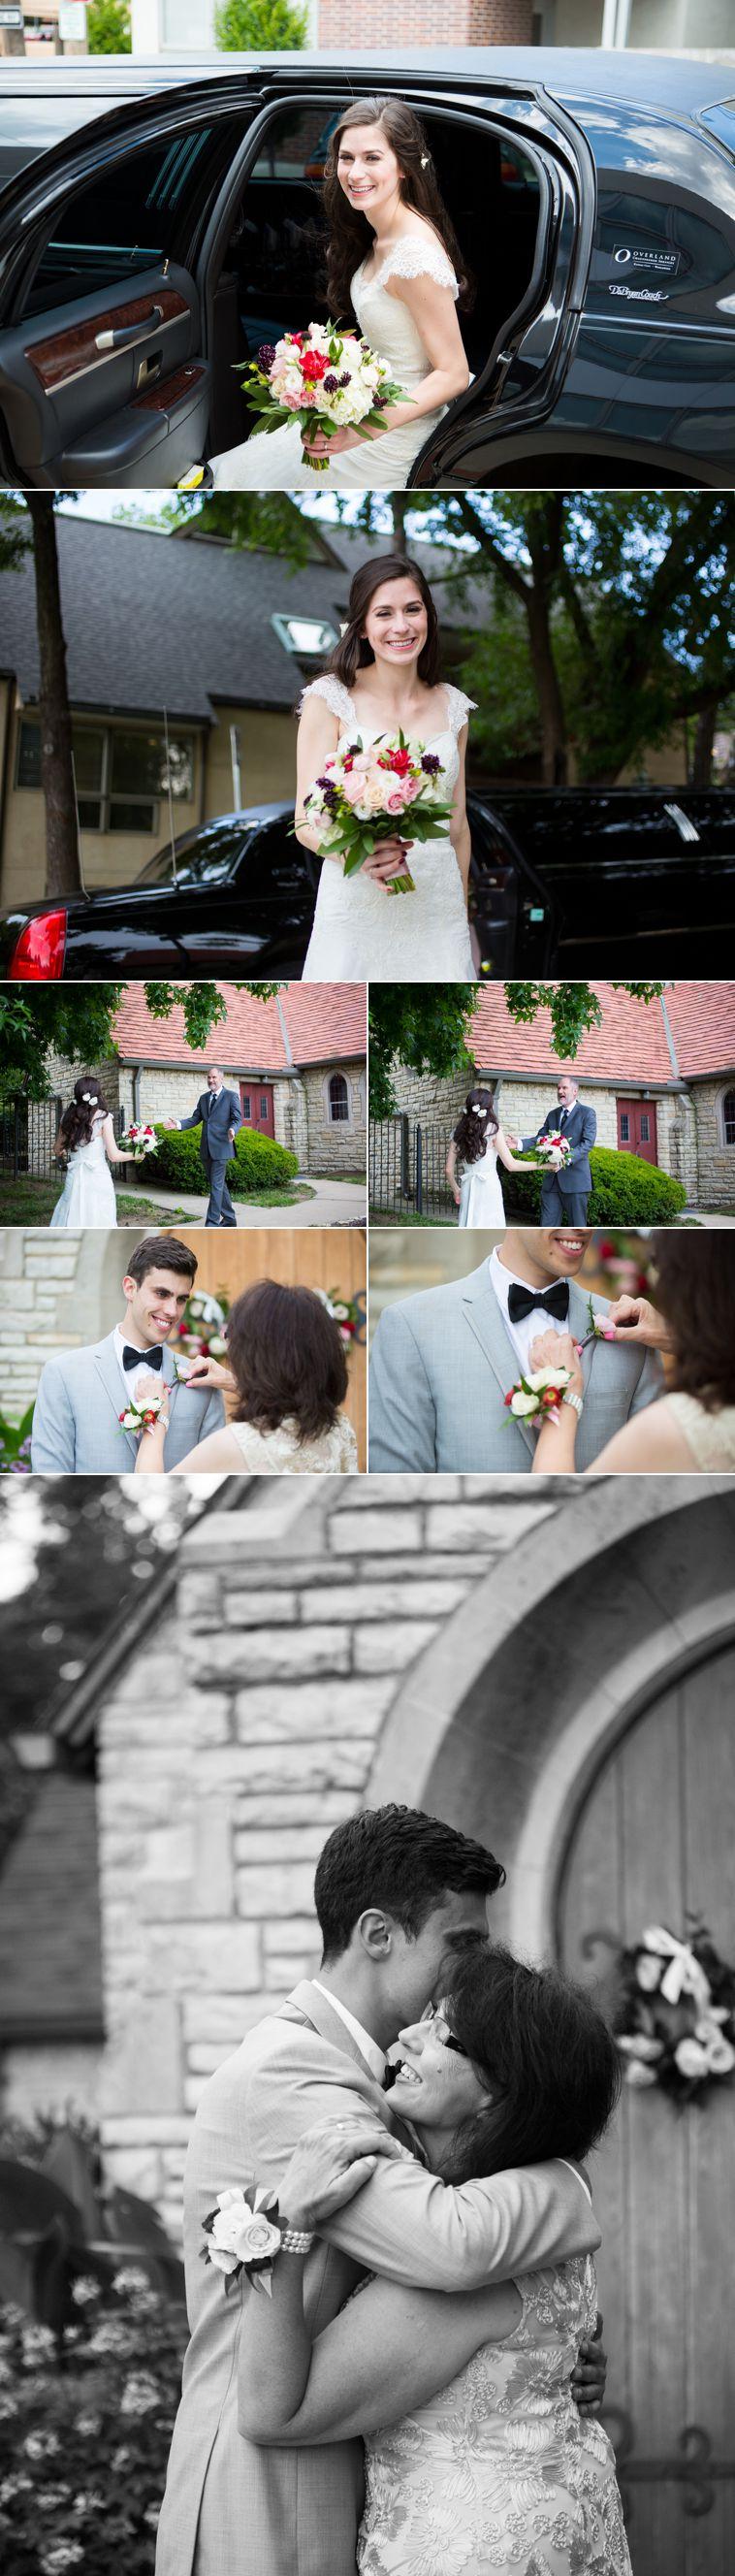 05_Kansas City Wedding Photography